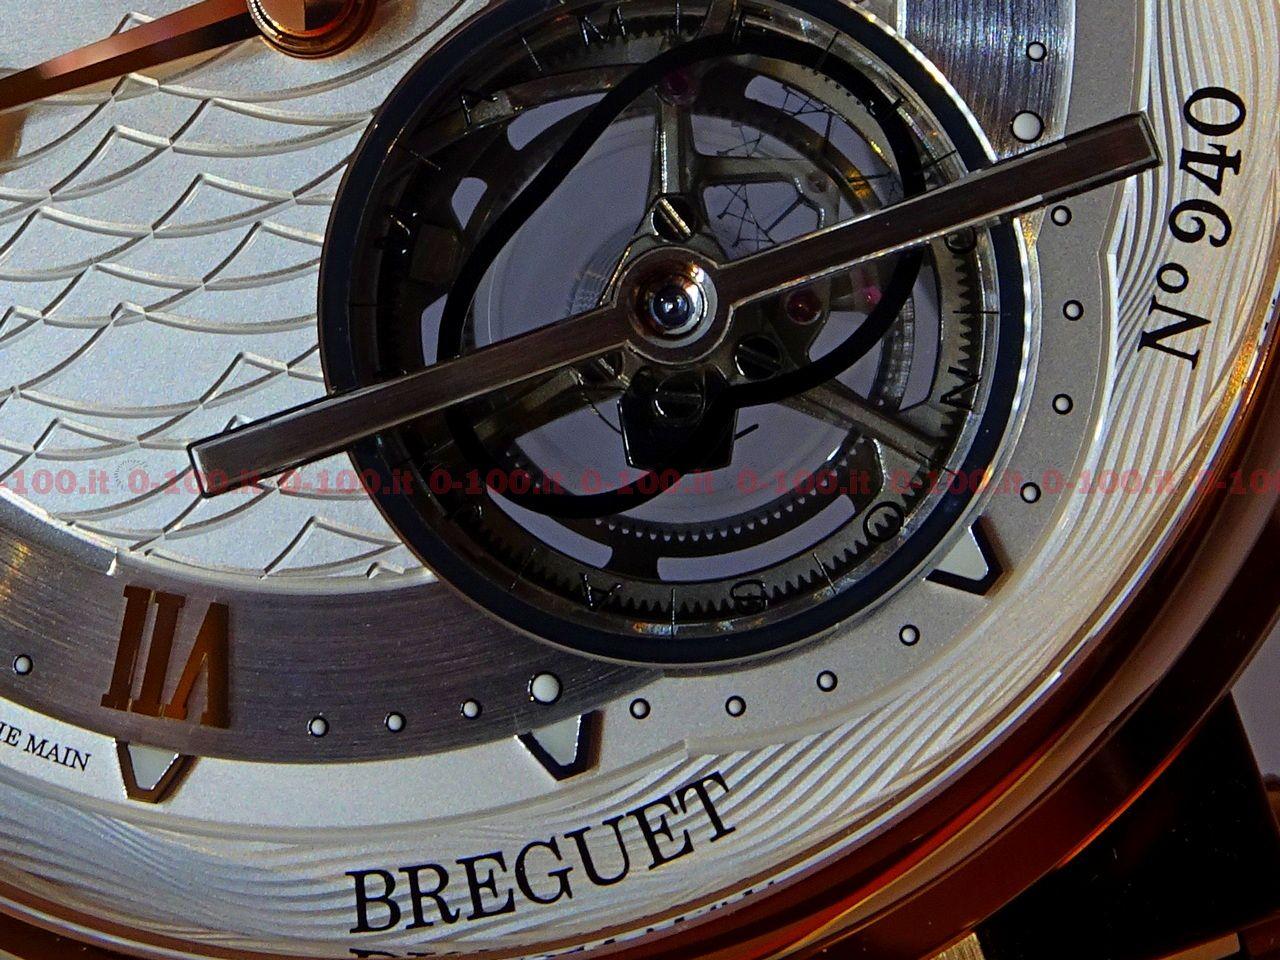 baselworld-2017-BREGUET MARINE ÉQUATION MARCHANTE 5887 REF. 5887PTY29WV -prezzo-price_0-1005